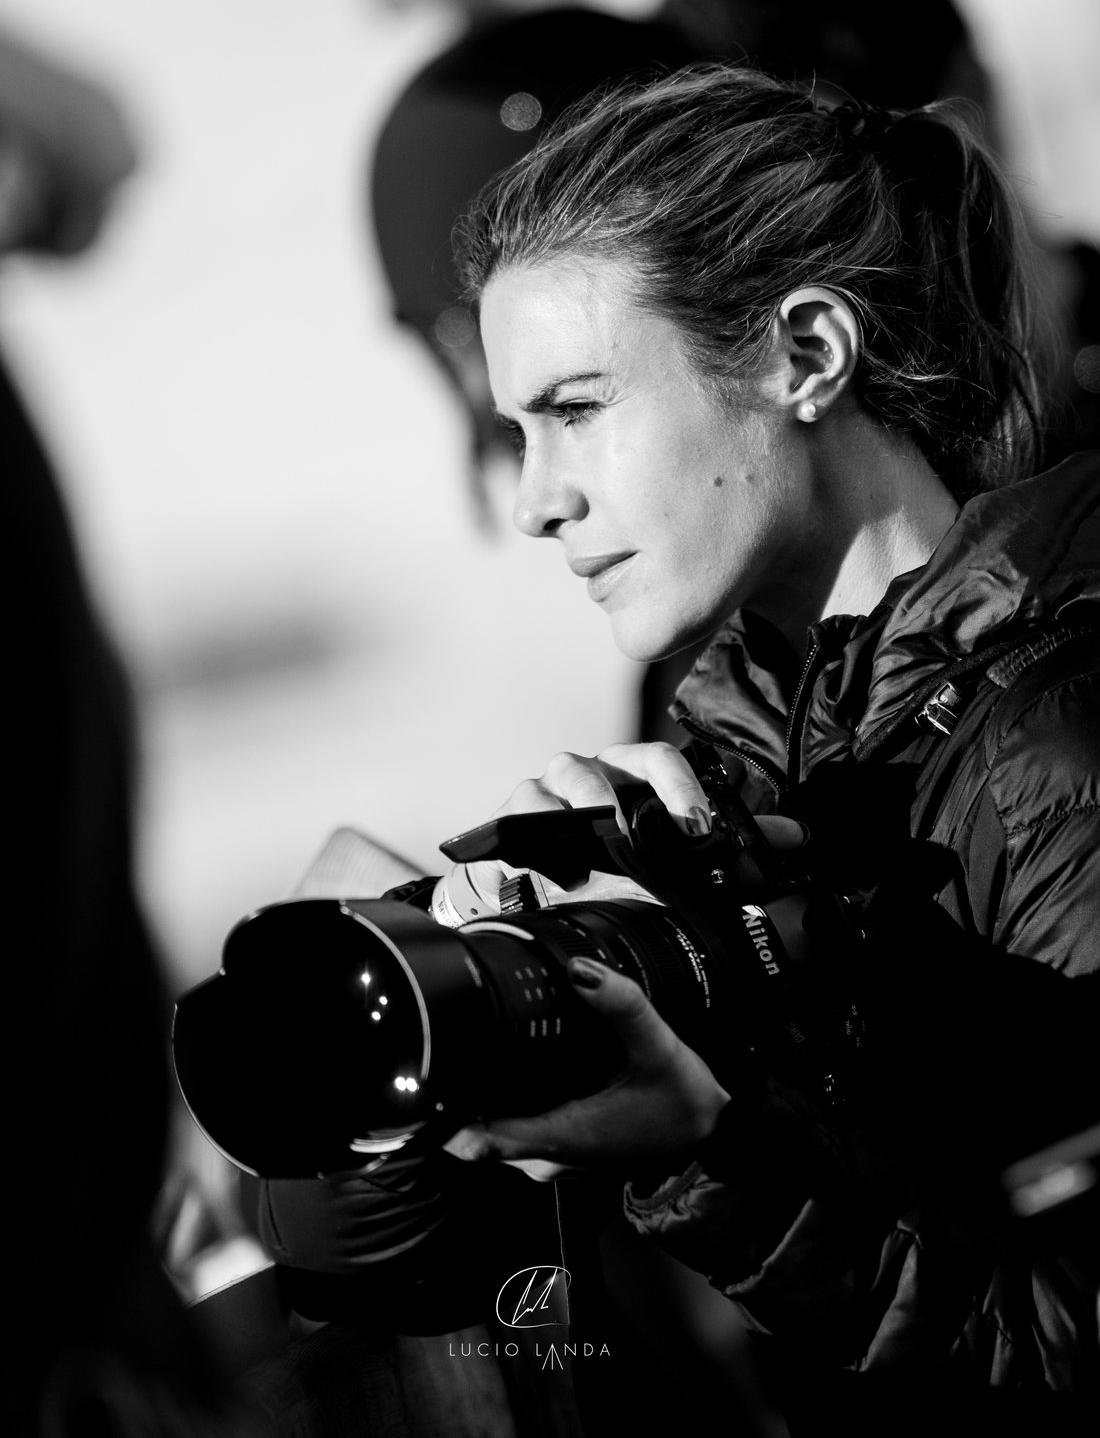 Photo by Lucio Landa